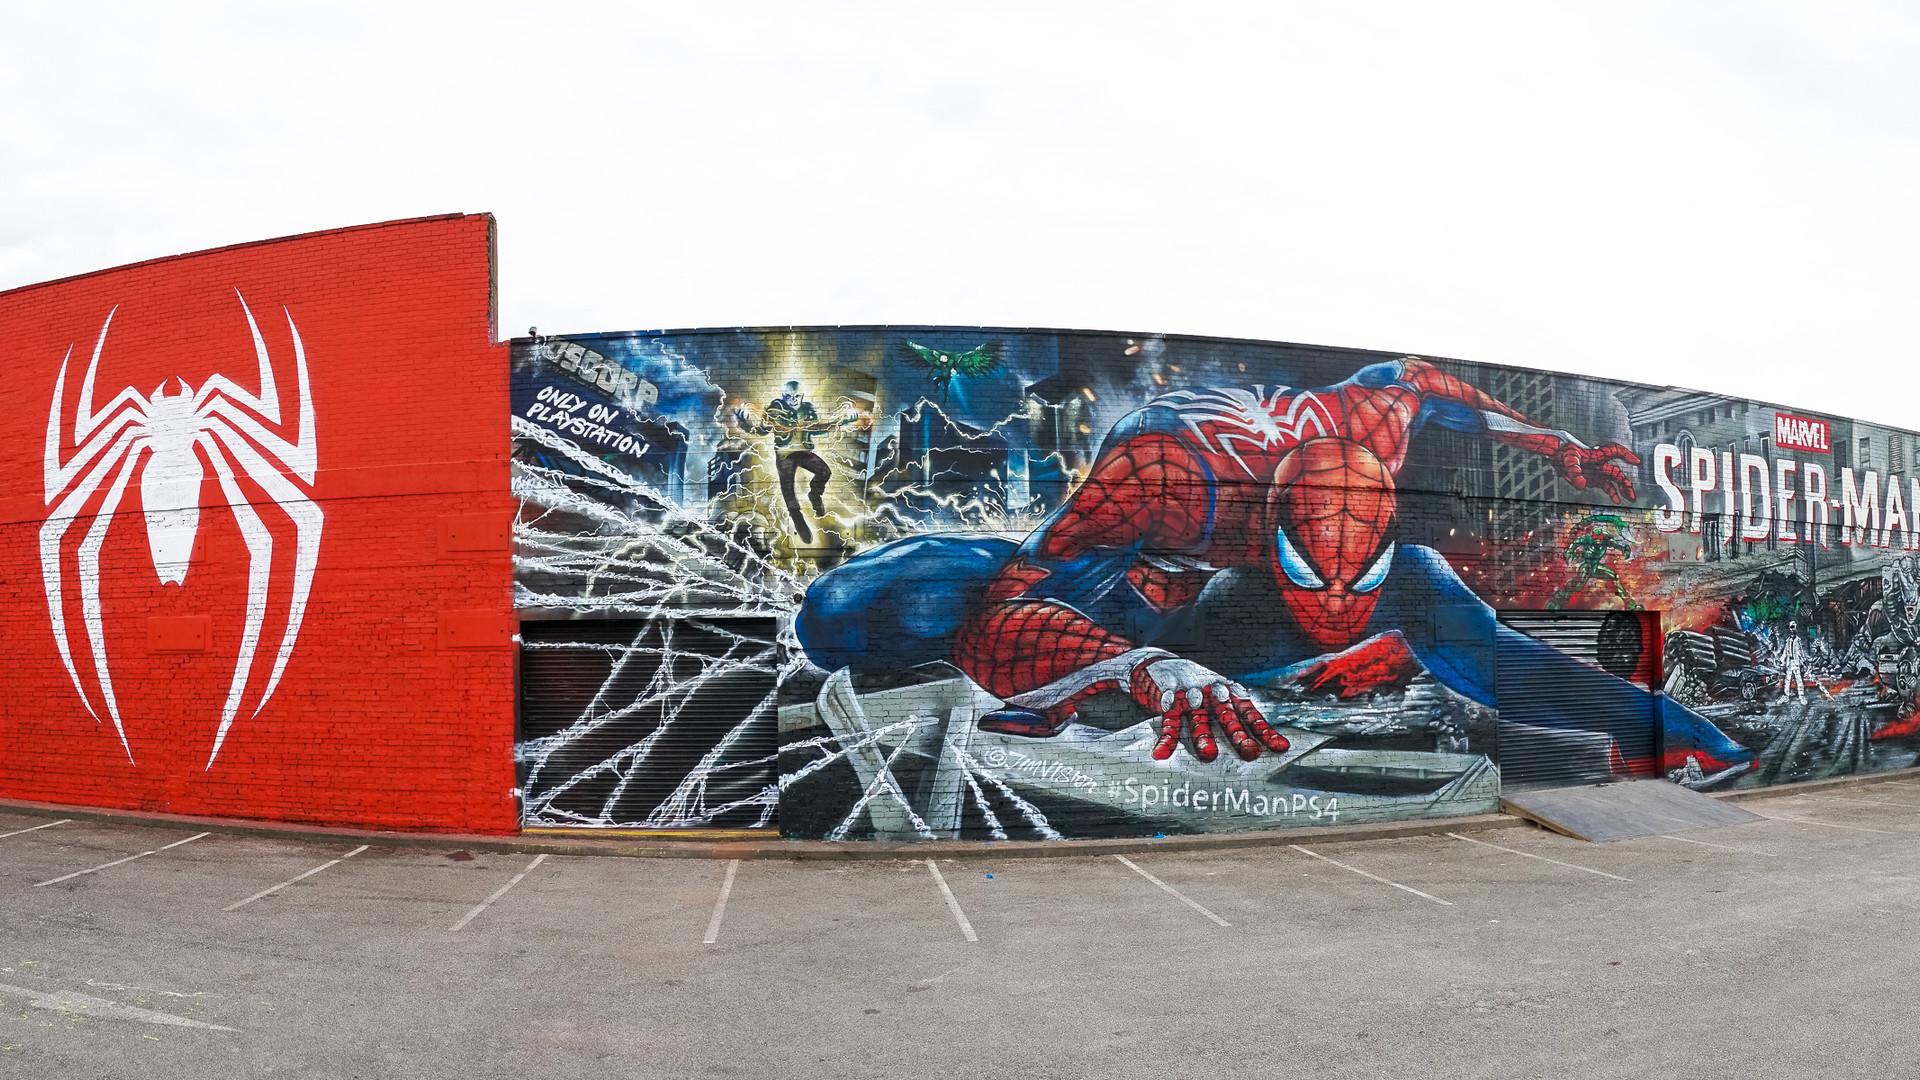 Spiderman PS4 birmingham.jpg